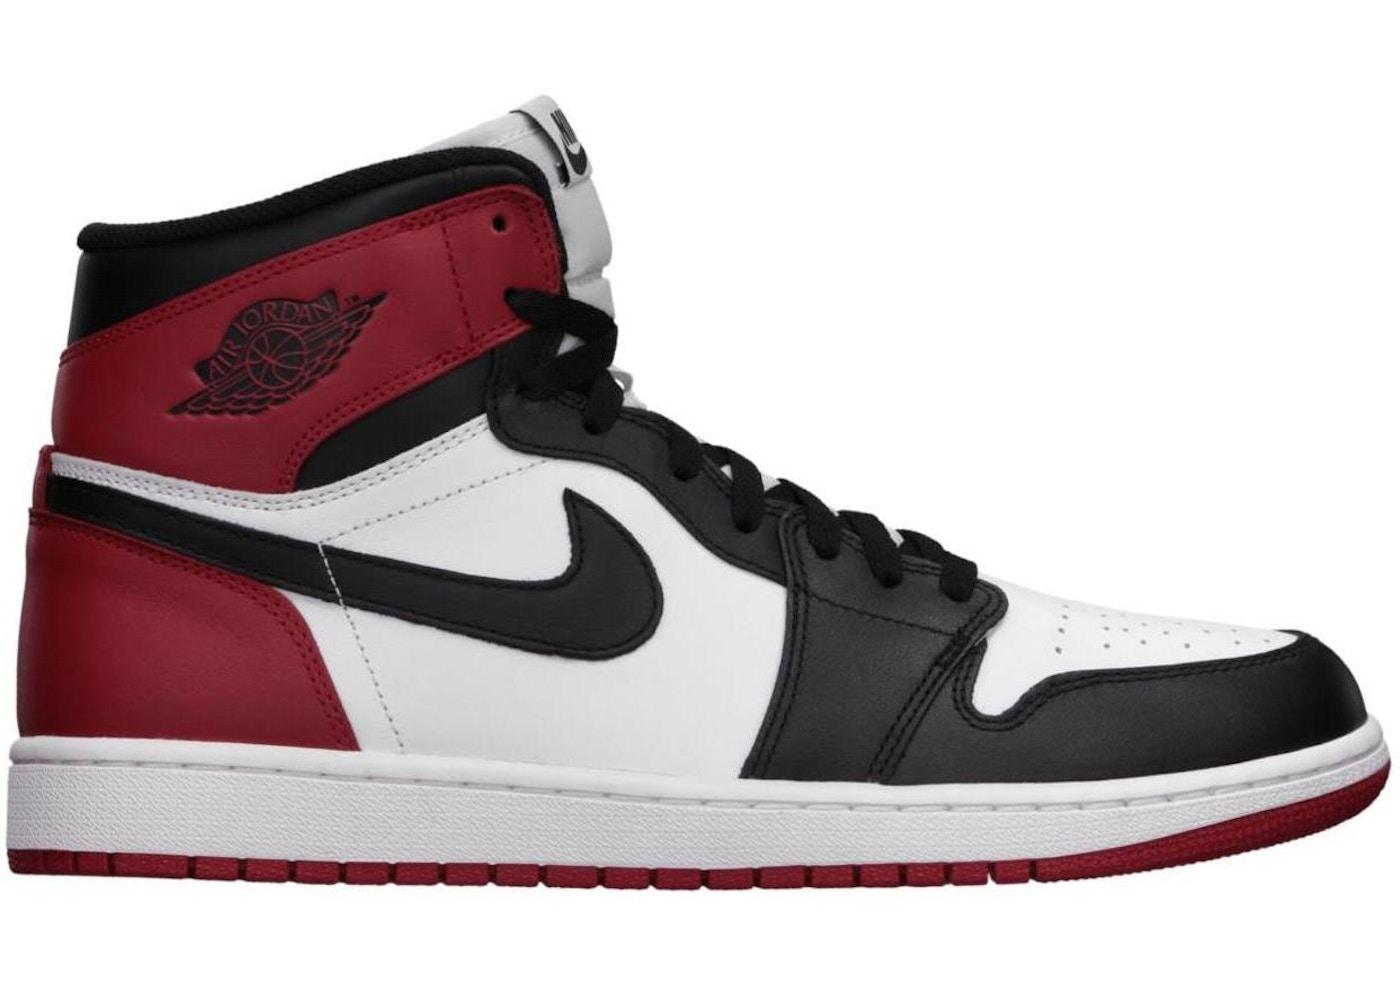 detailed look 7c883 84136 Jordan 1 Retro Black Toe (2013) - 555088-184